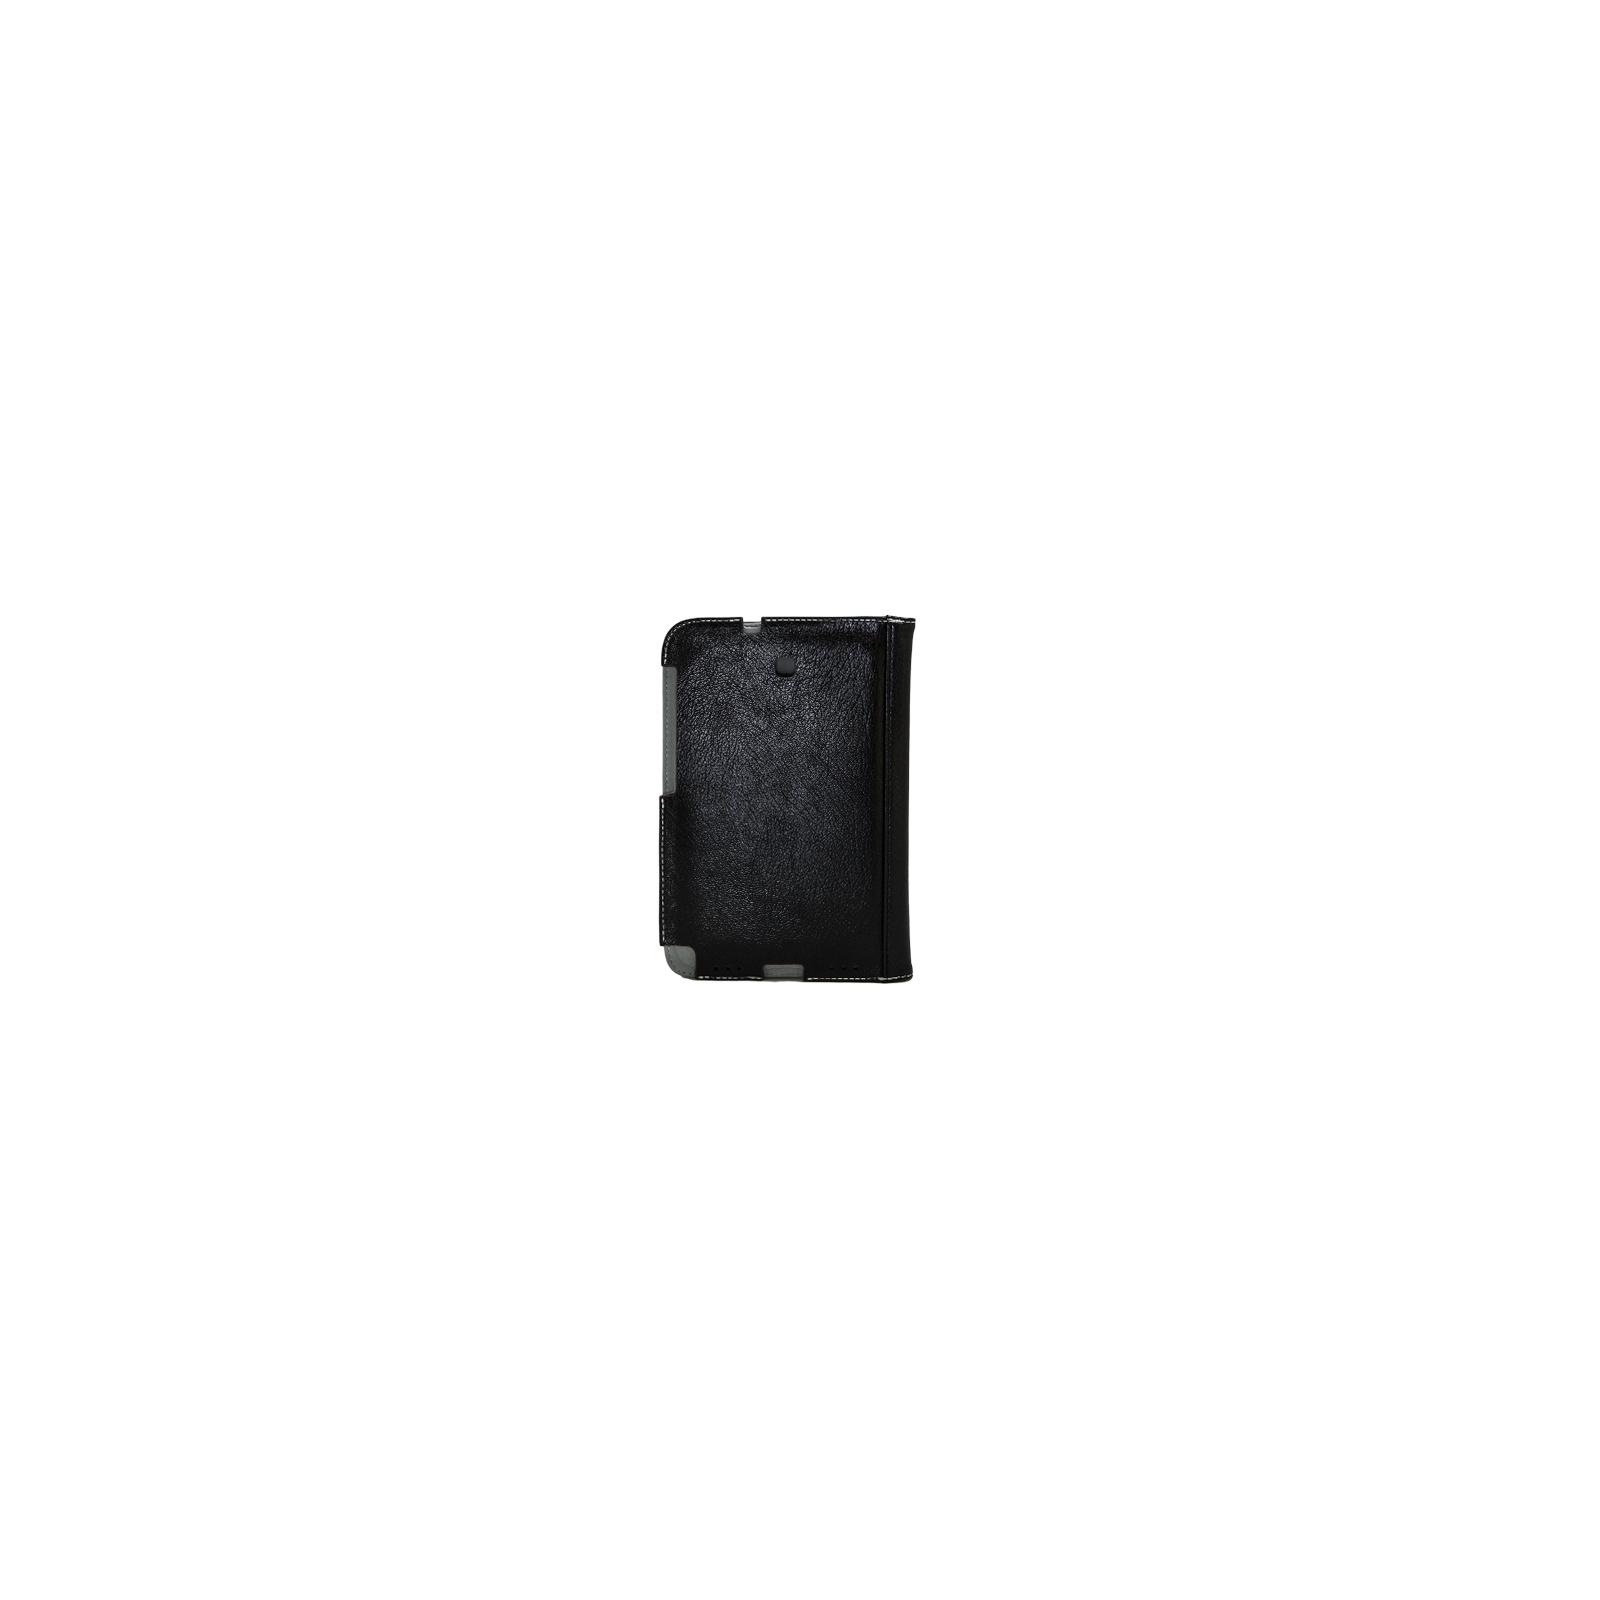 Чехол для планшета Drobak 8 Samsung Galaxy Note (N5100) Comfort Style/Black (215256) изображение 4